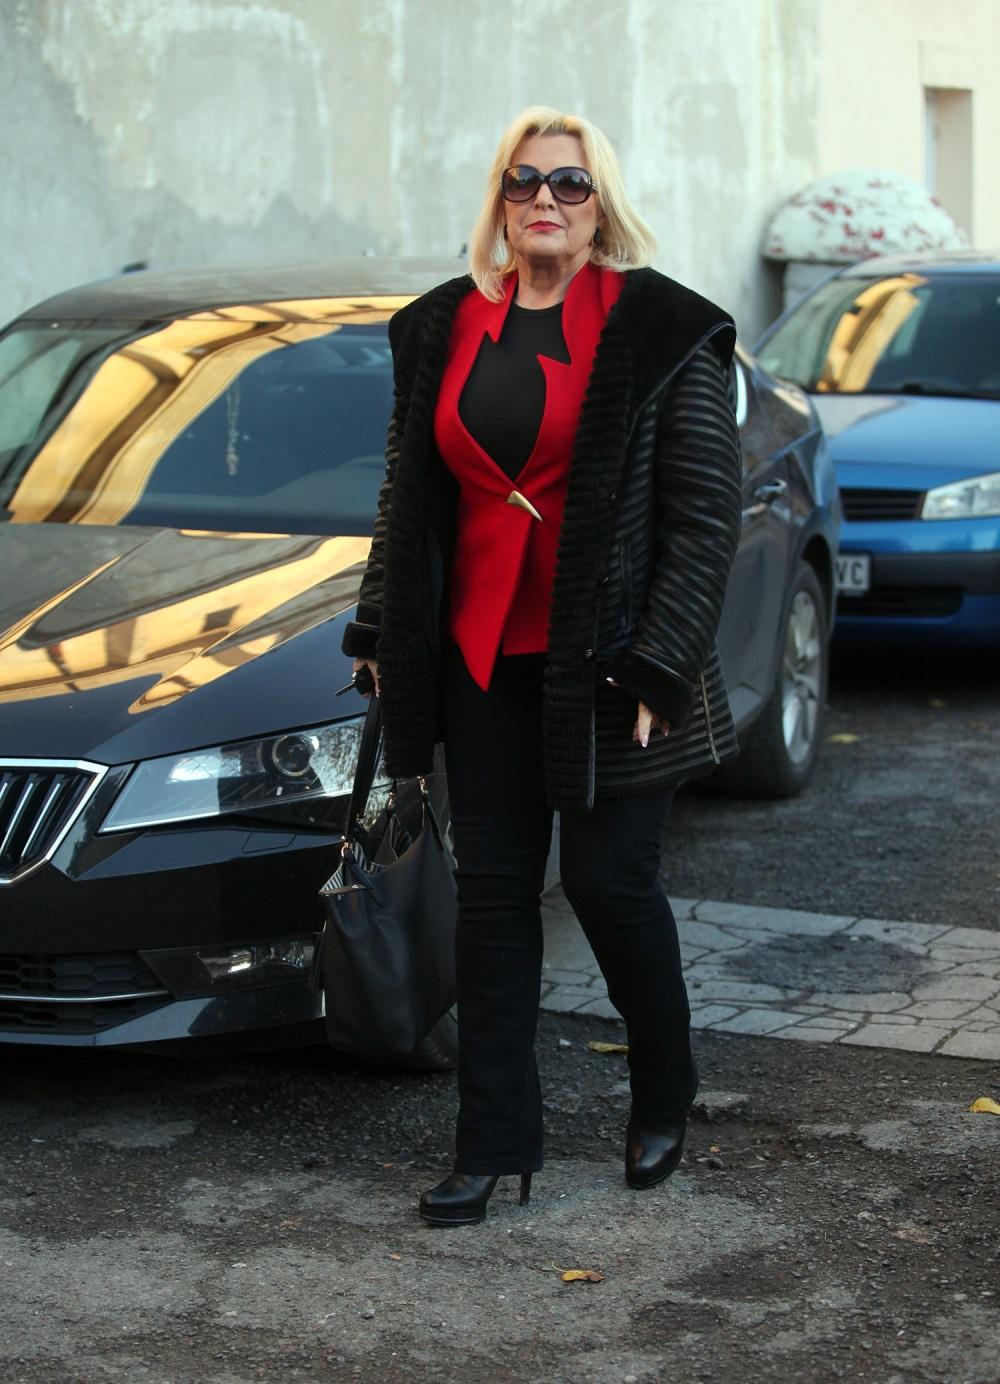 ŠOK !!! Ćerka joj je bezobrazna, a sin podložan porocima...Snežana Đurišić otvorila dušu